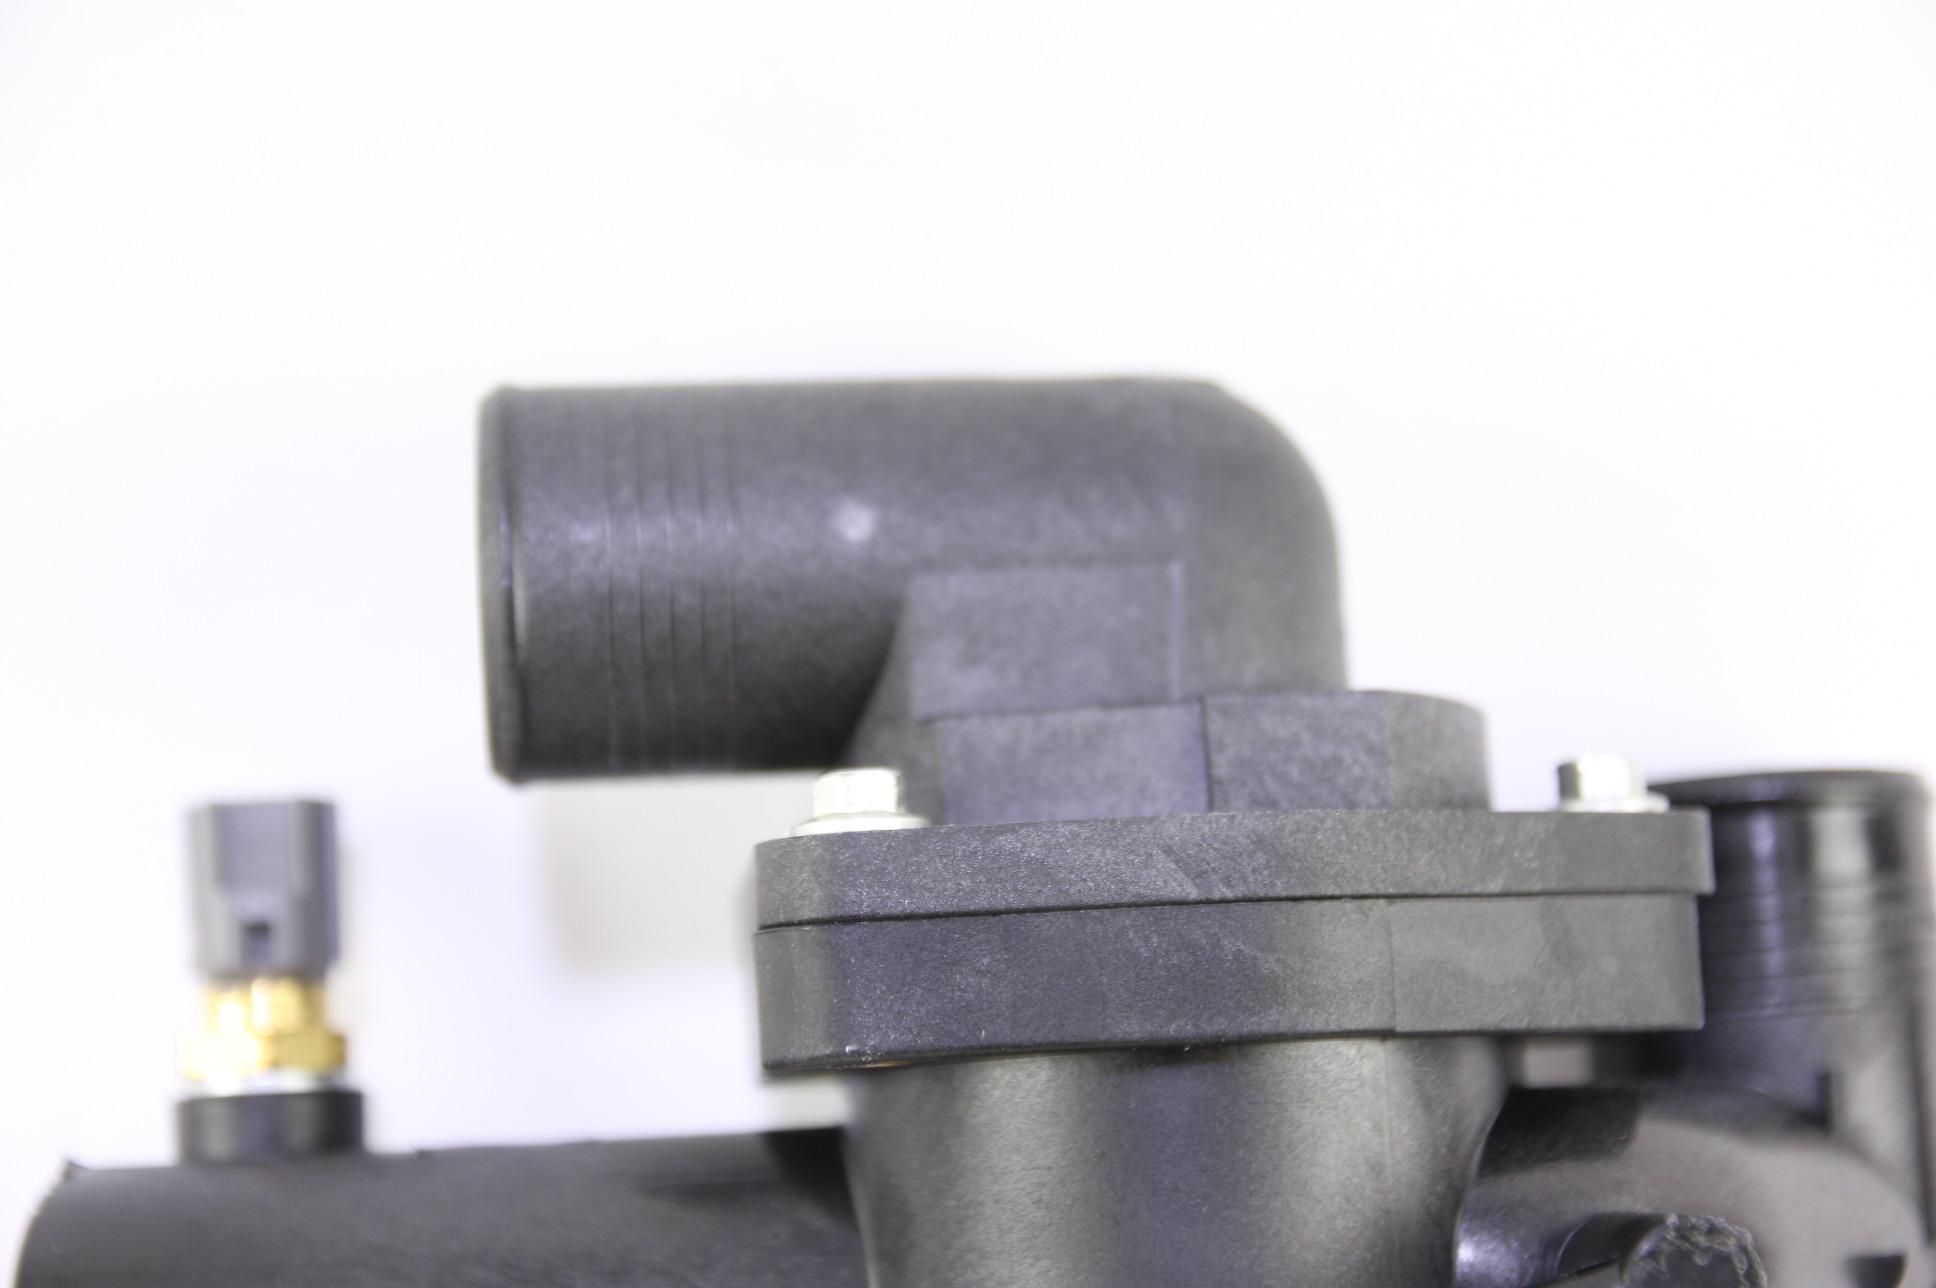 ** New OEM AJ89486 Jaguar 03-06 XK8 4.2L V8 Engine Coolant Thermostat Housing - image 4